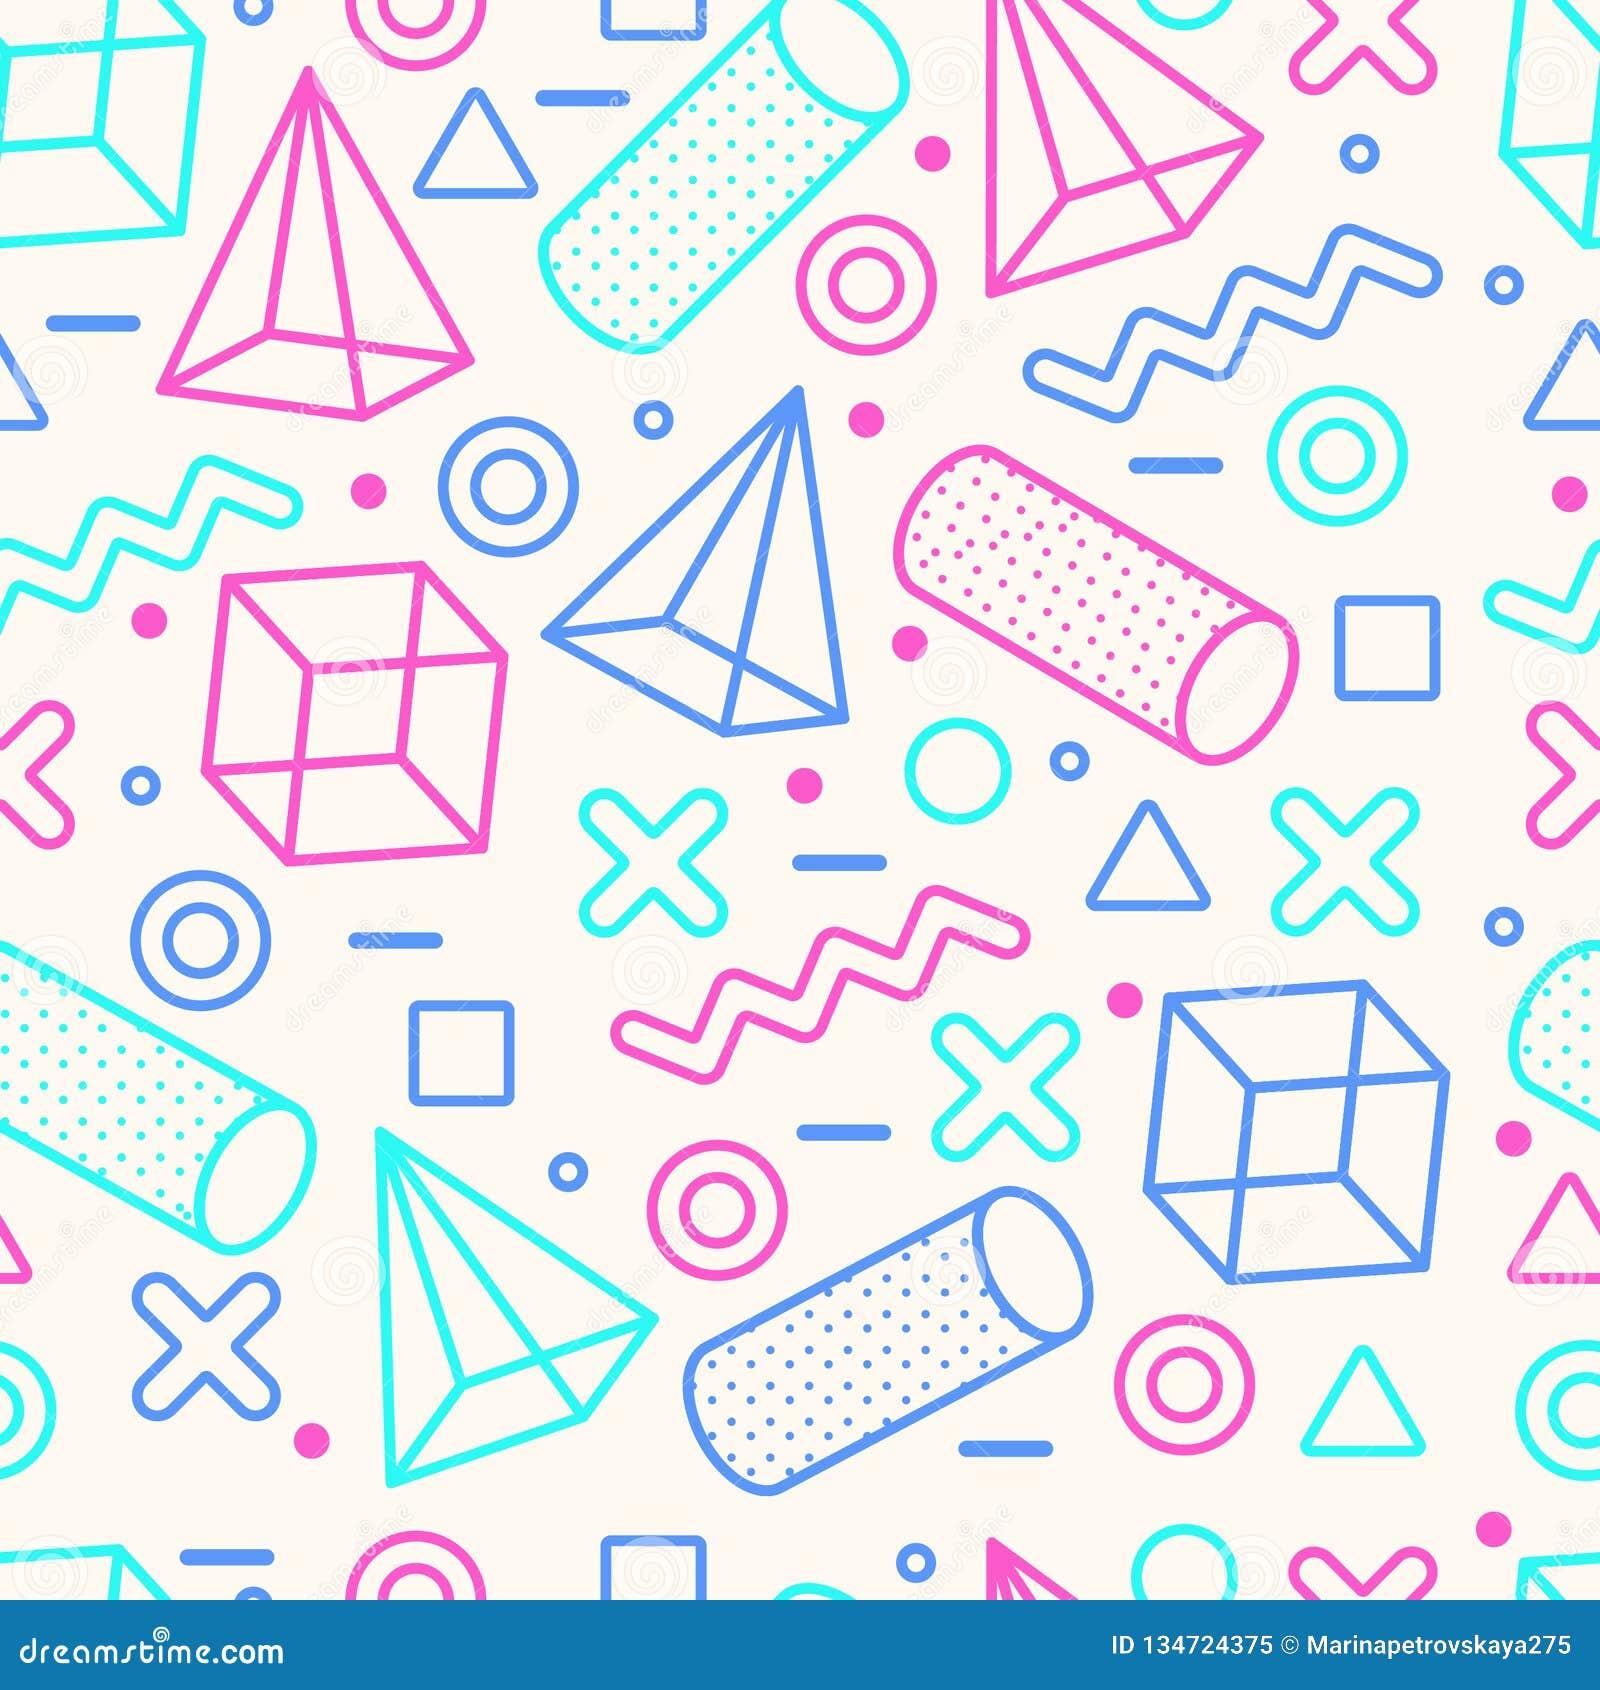 Memphis Style Seamless Pattern abstrato com formas geométricas